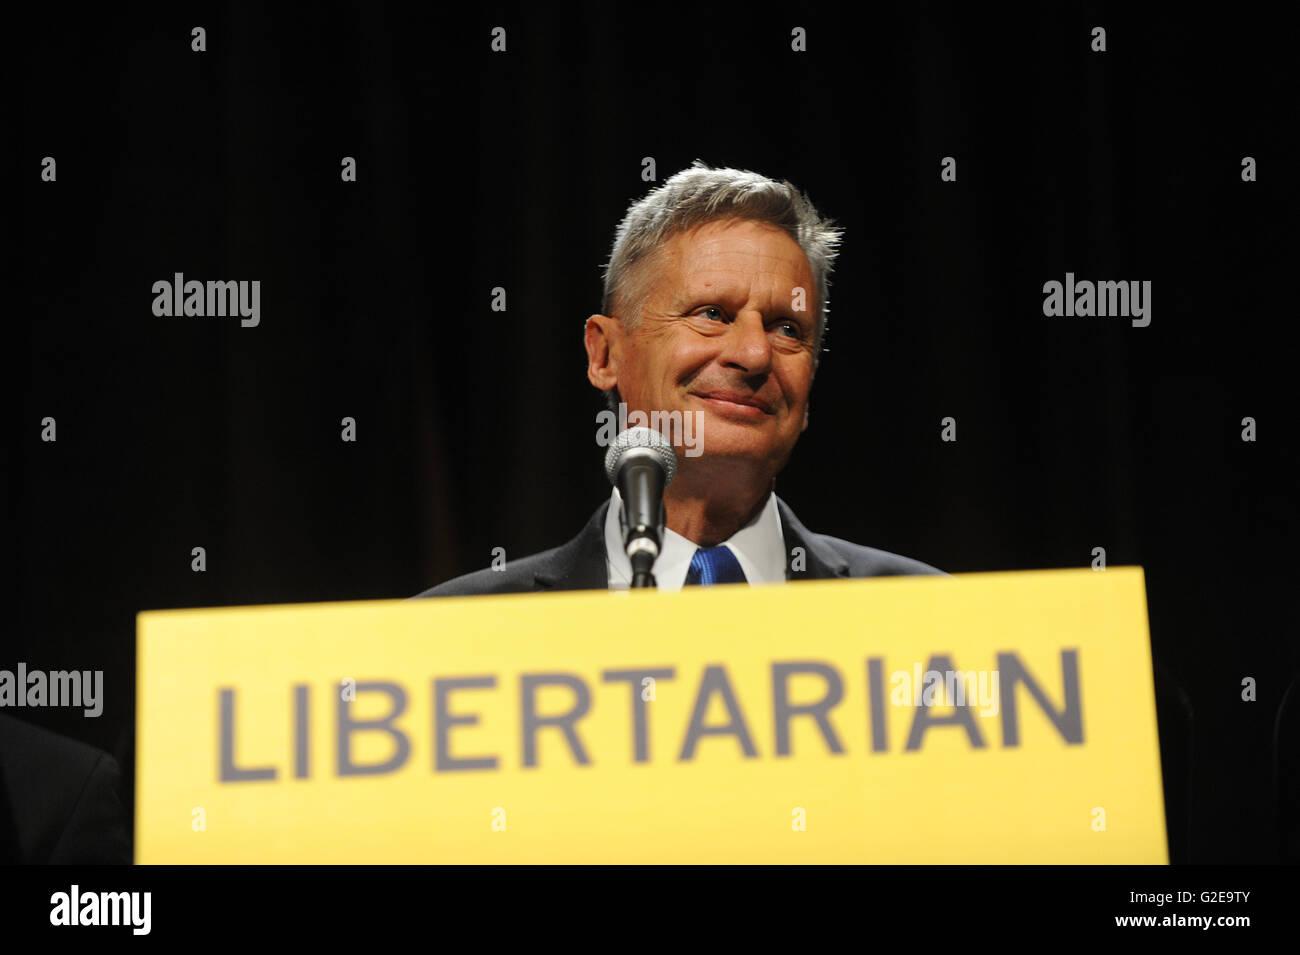 Orlando, Florida, USA. 28. Mai 2016. Libertäre Partei Präsidentschaftskandidat, ehemaliger Gouverneur Stockbild